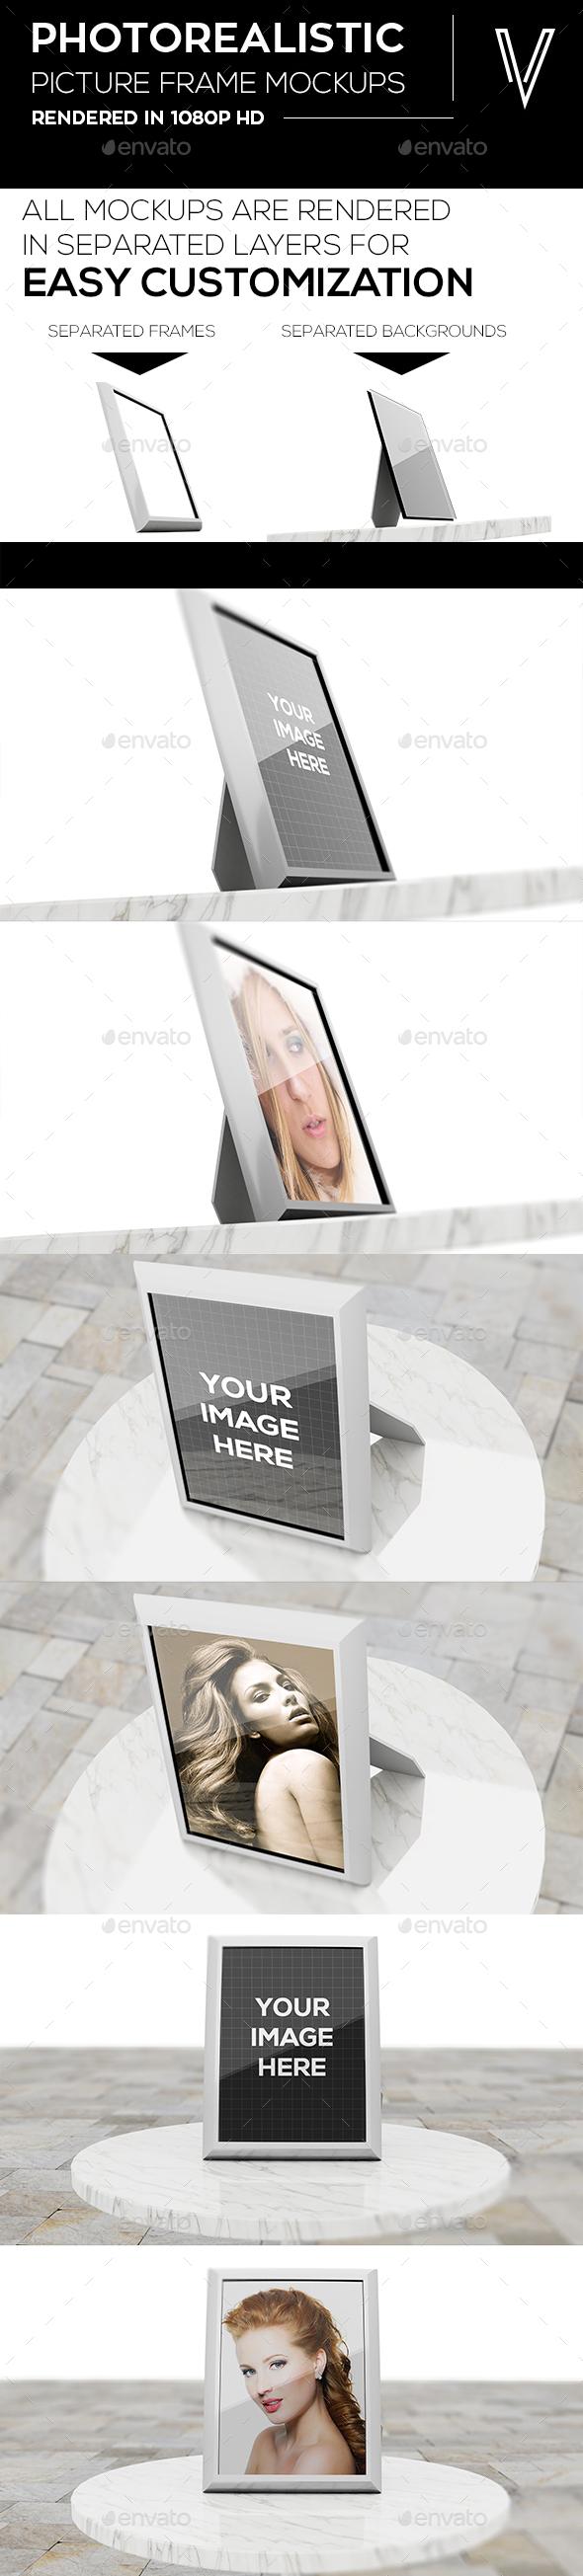 GraphicRiver Photo Frame Mockups 20256703